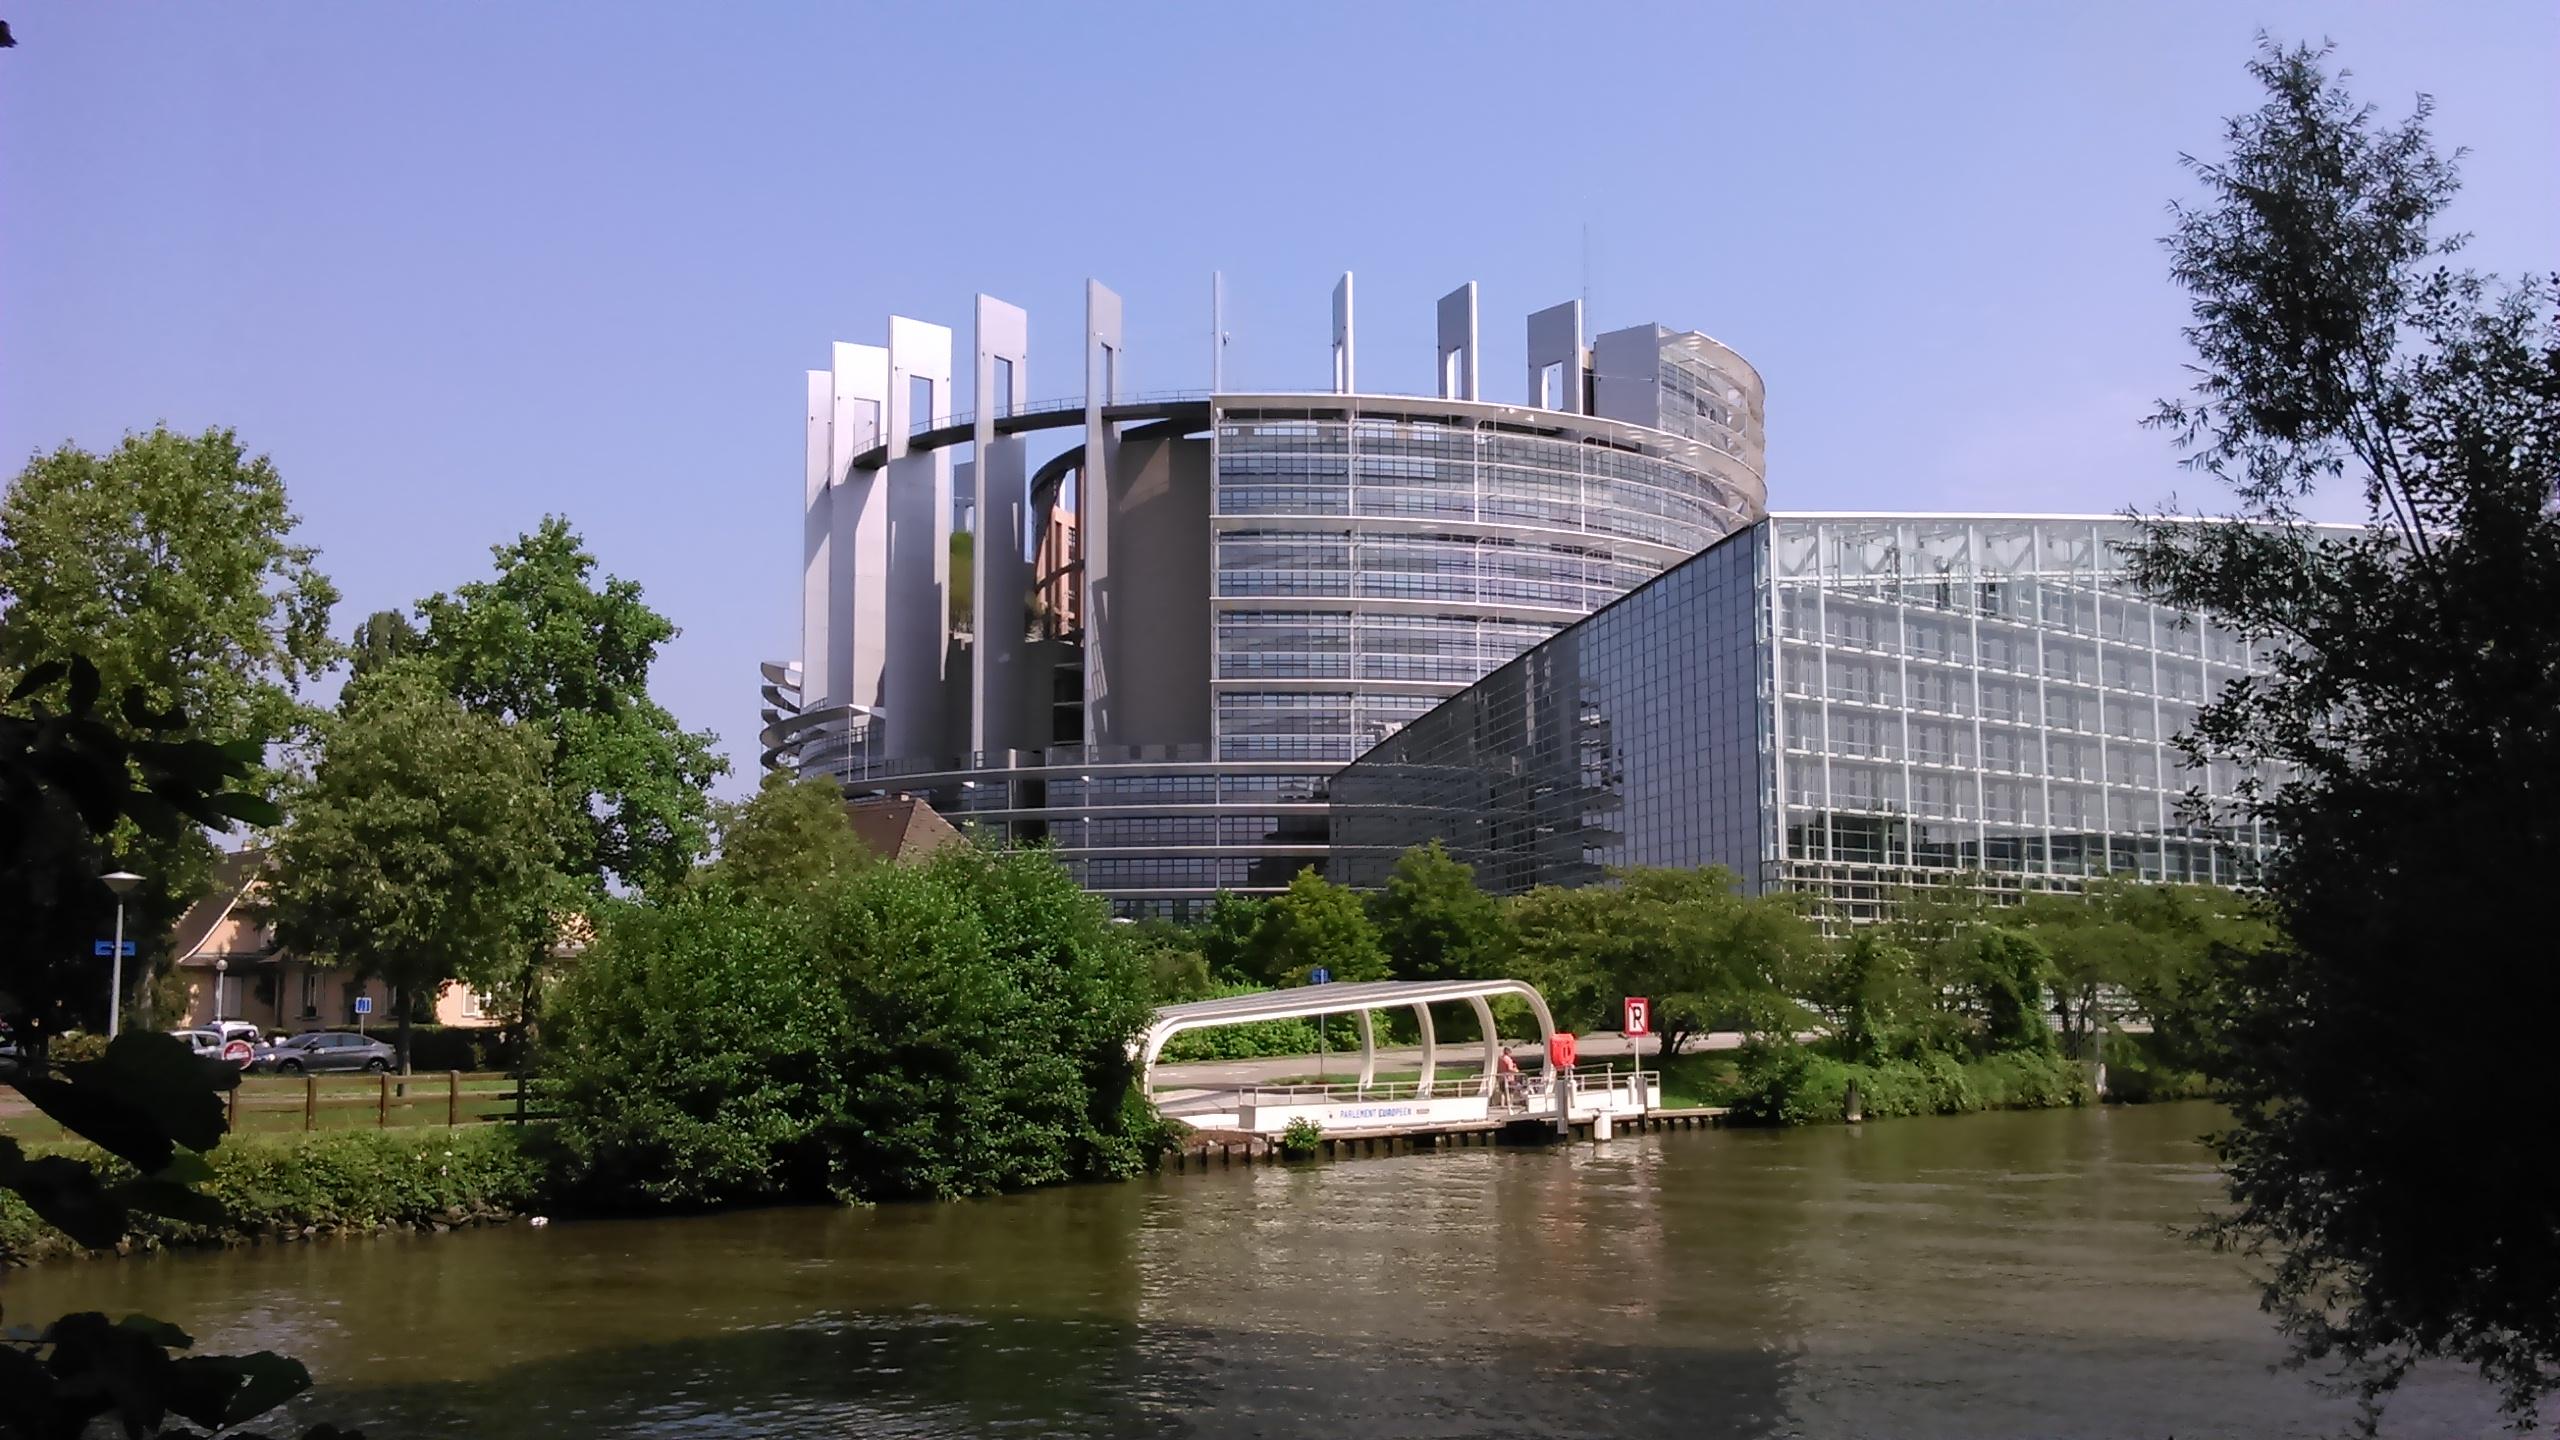 Strasbourg photo voyages cartes - Piscine a strasbourg ...